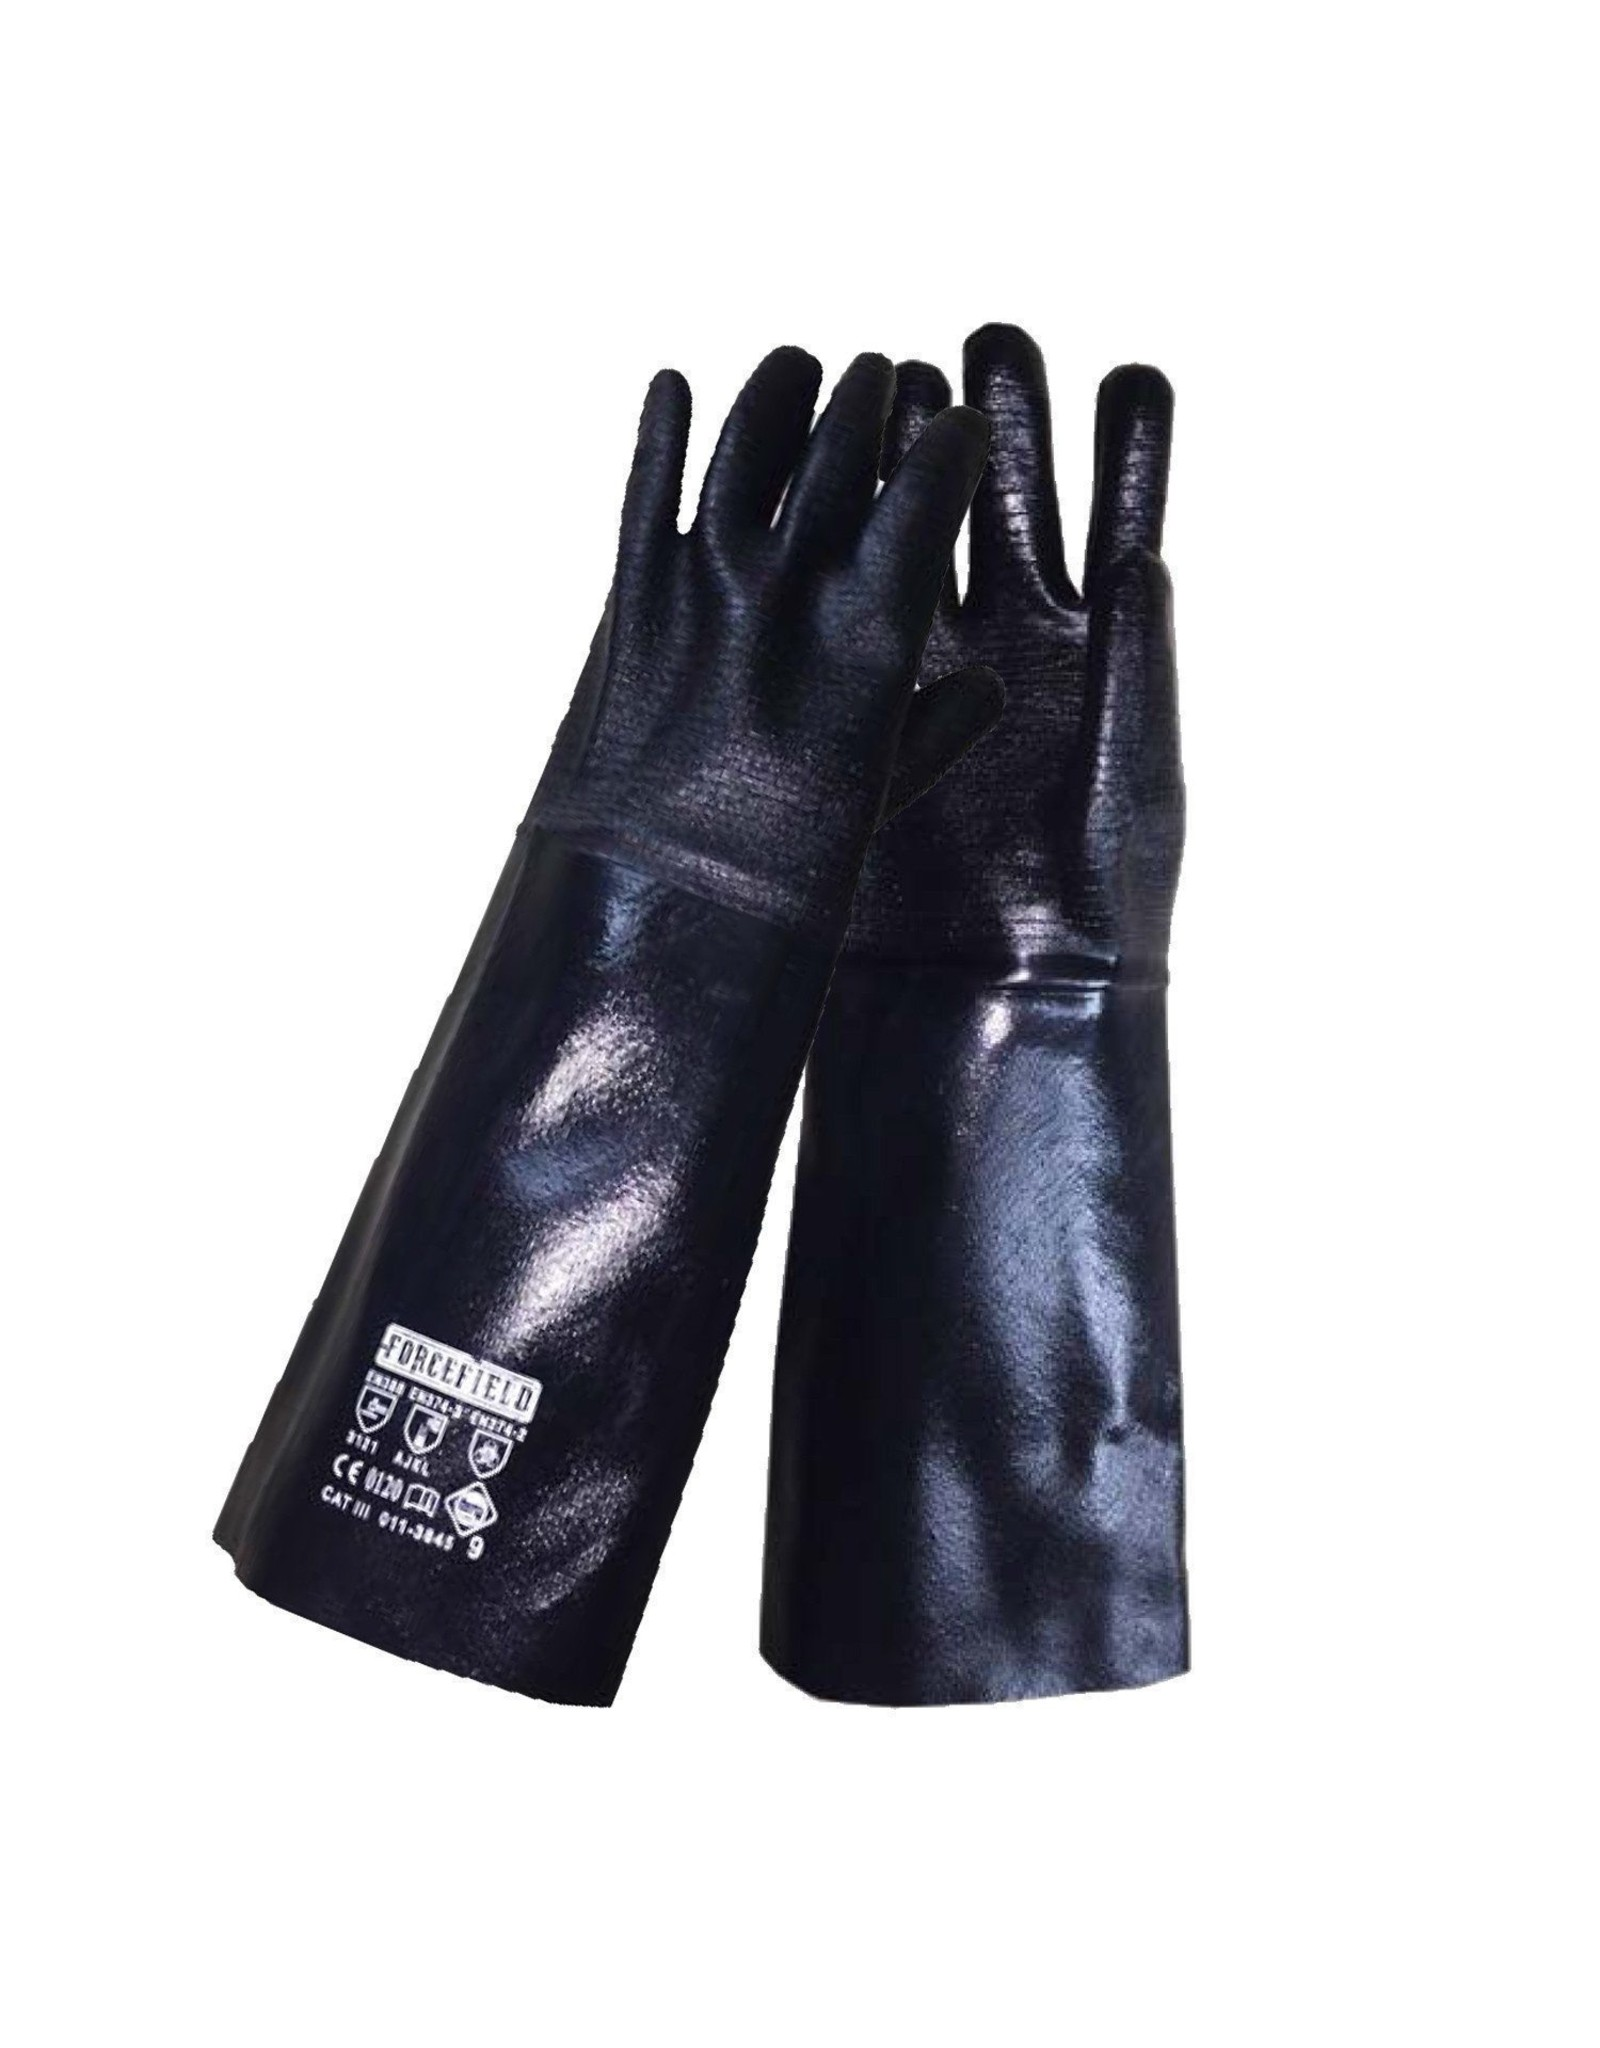 18'' Neoprene Gauntlet, Chemical Resistant gloves size medium